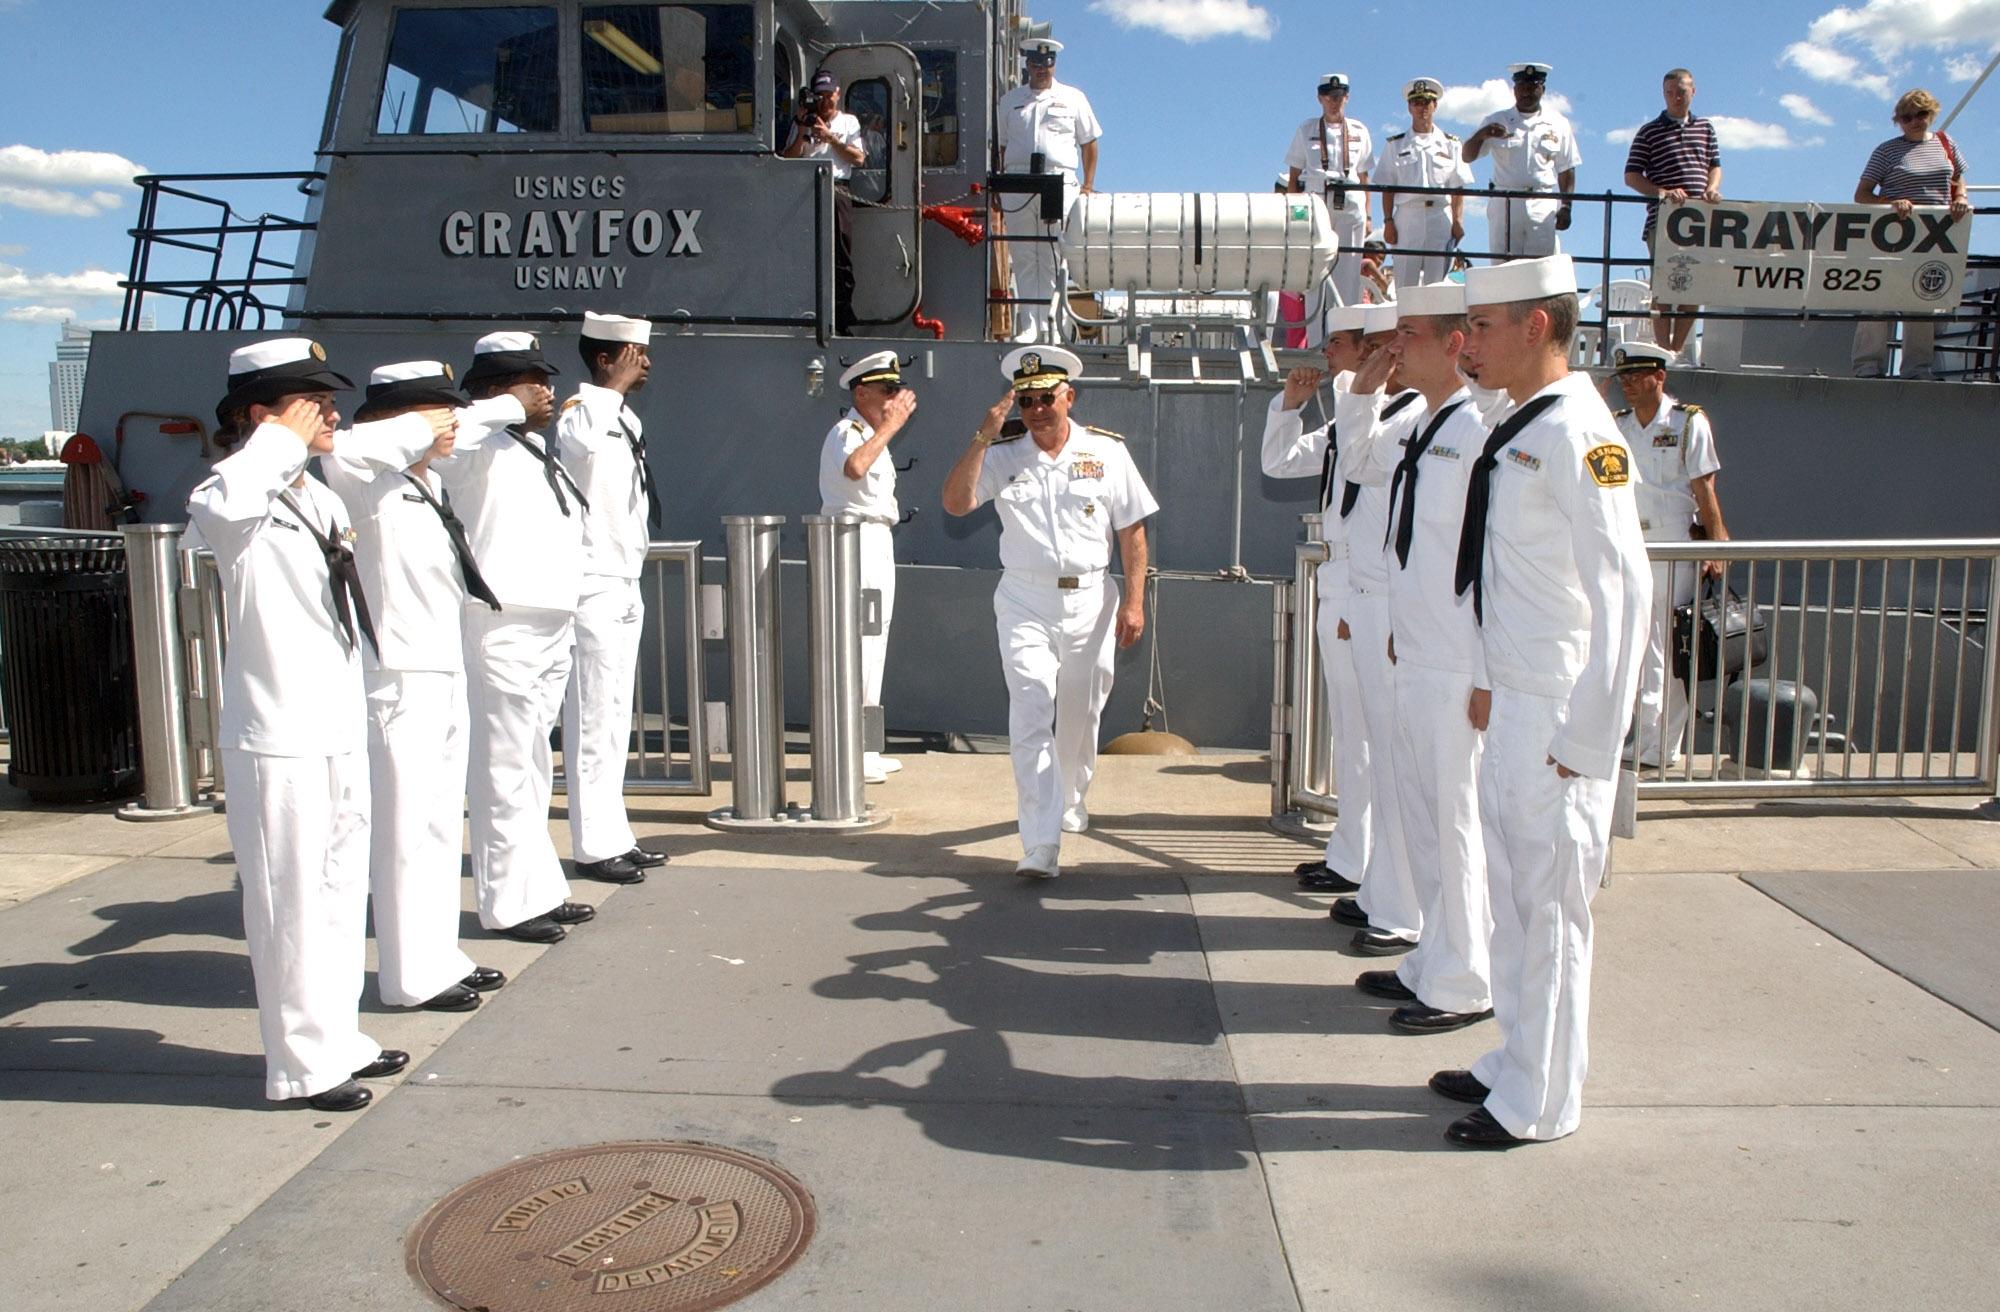 United States Naval Sea Cadet Corps | Military Wiki | FANDOM powered